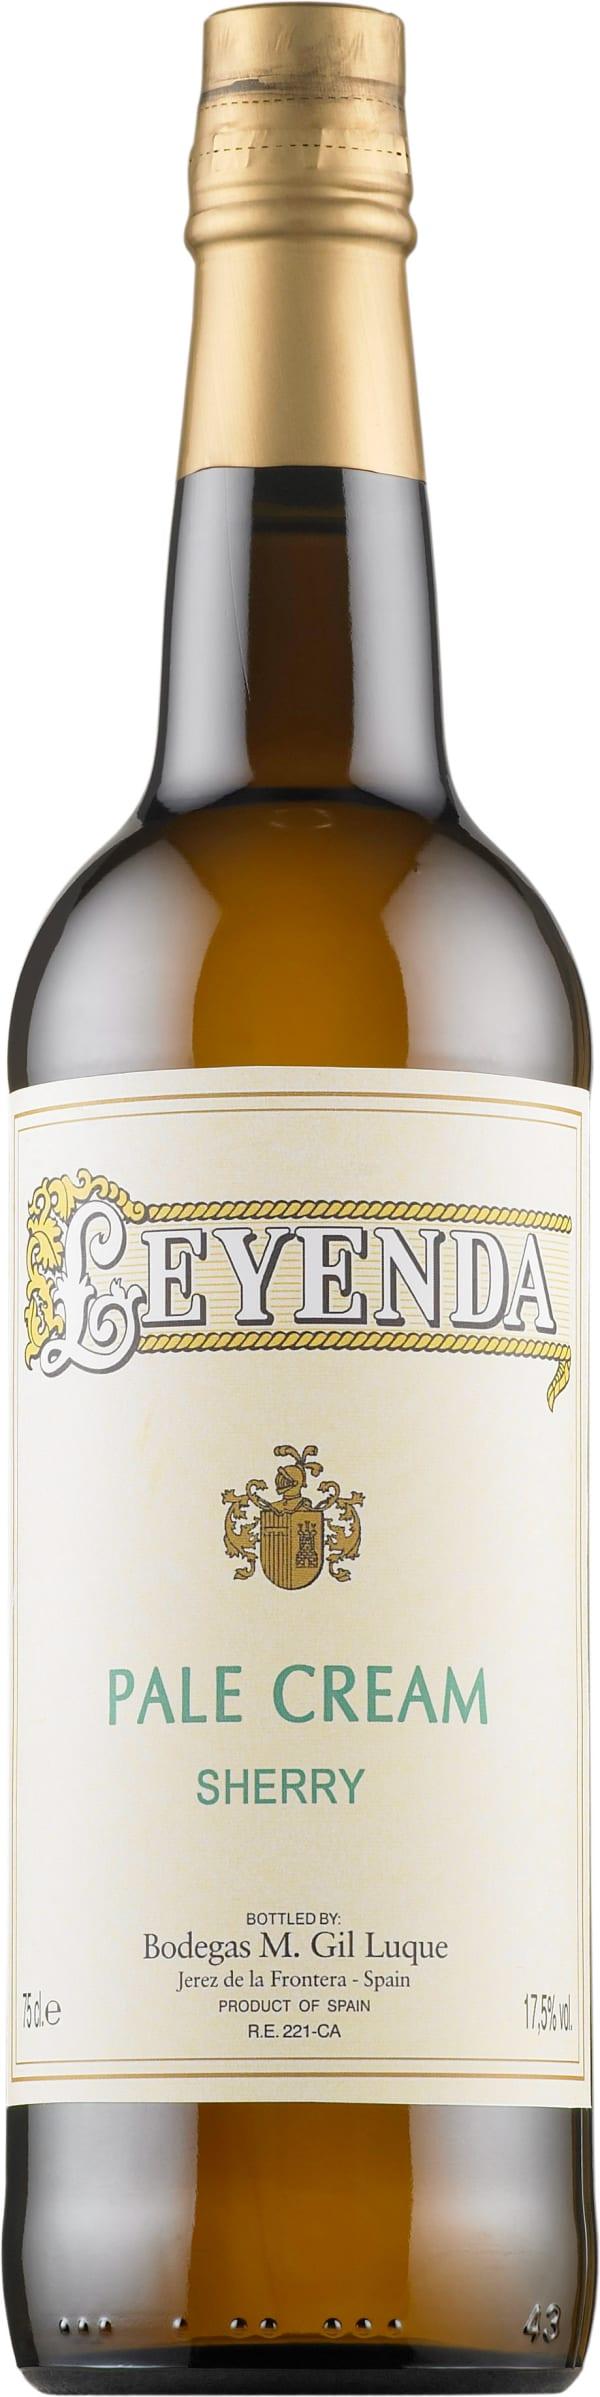 Leyenda Pale Cream Sherry